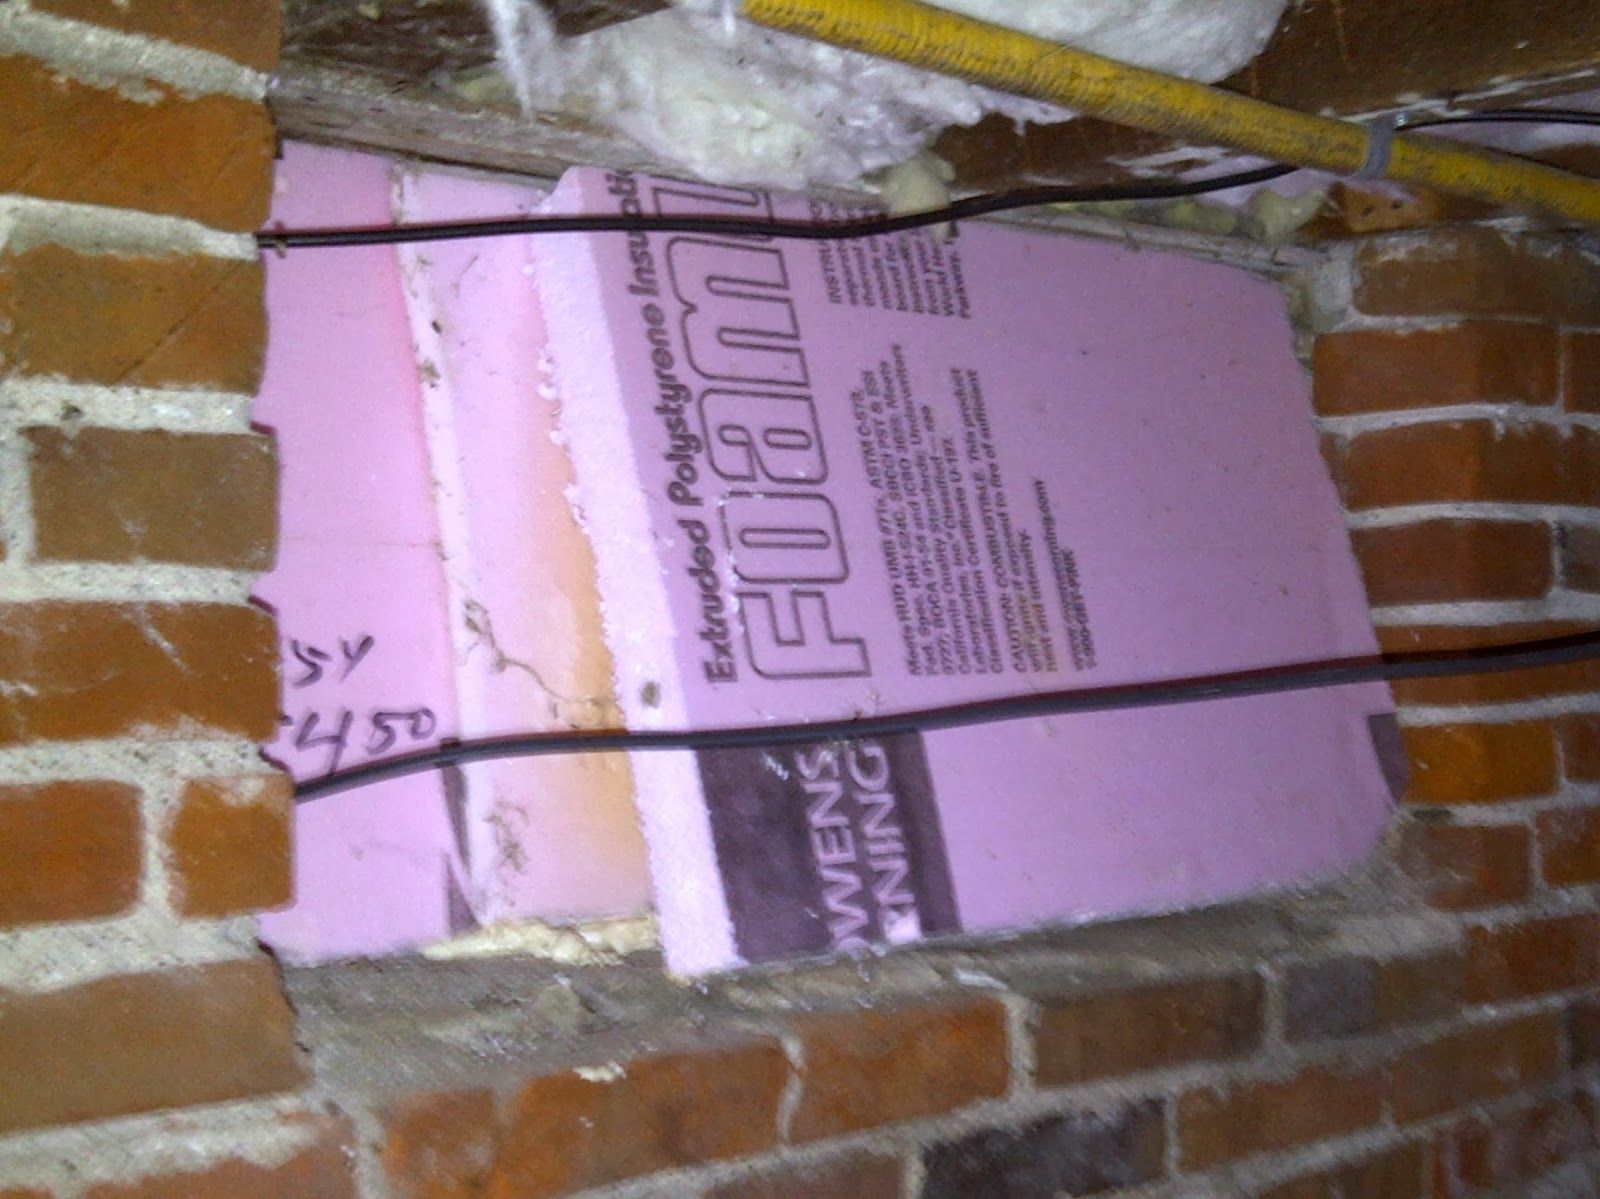 Insulate Old Basement Windowshome insulation save money on utility bills penny pincher journal